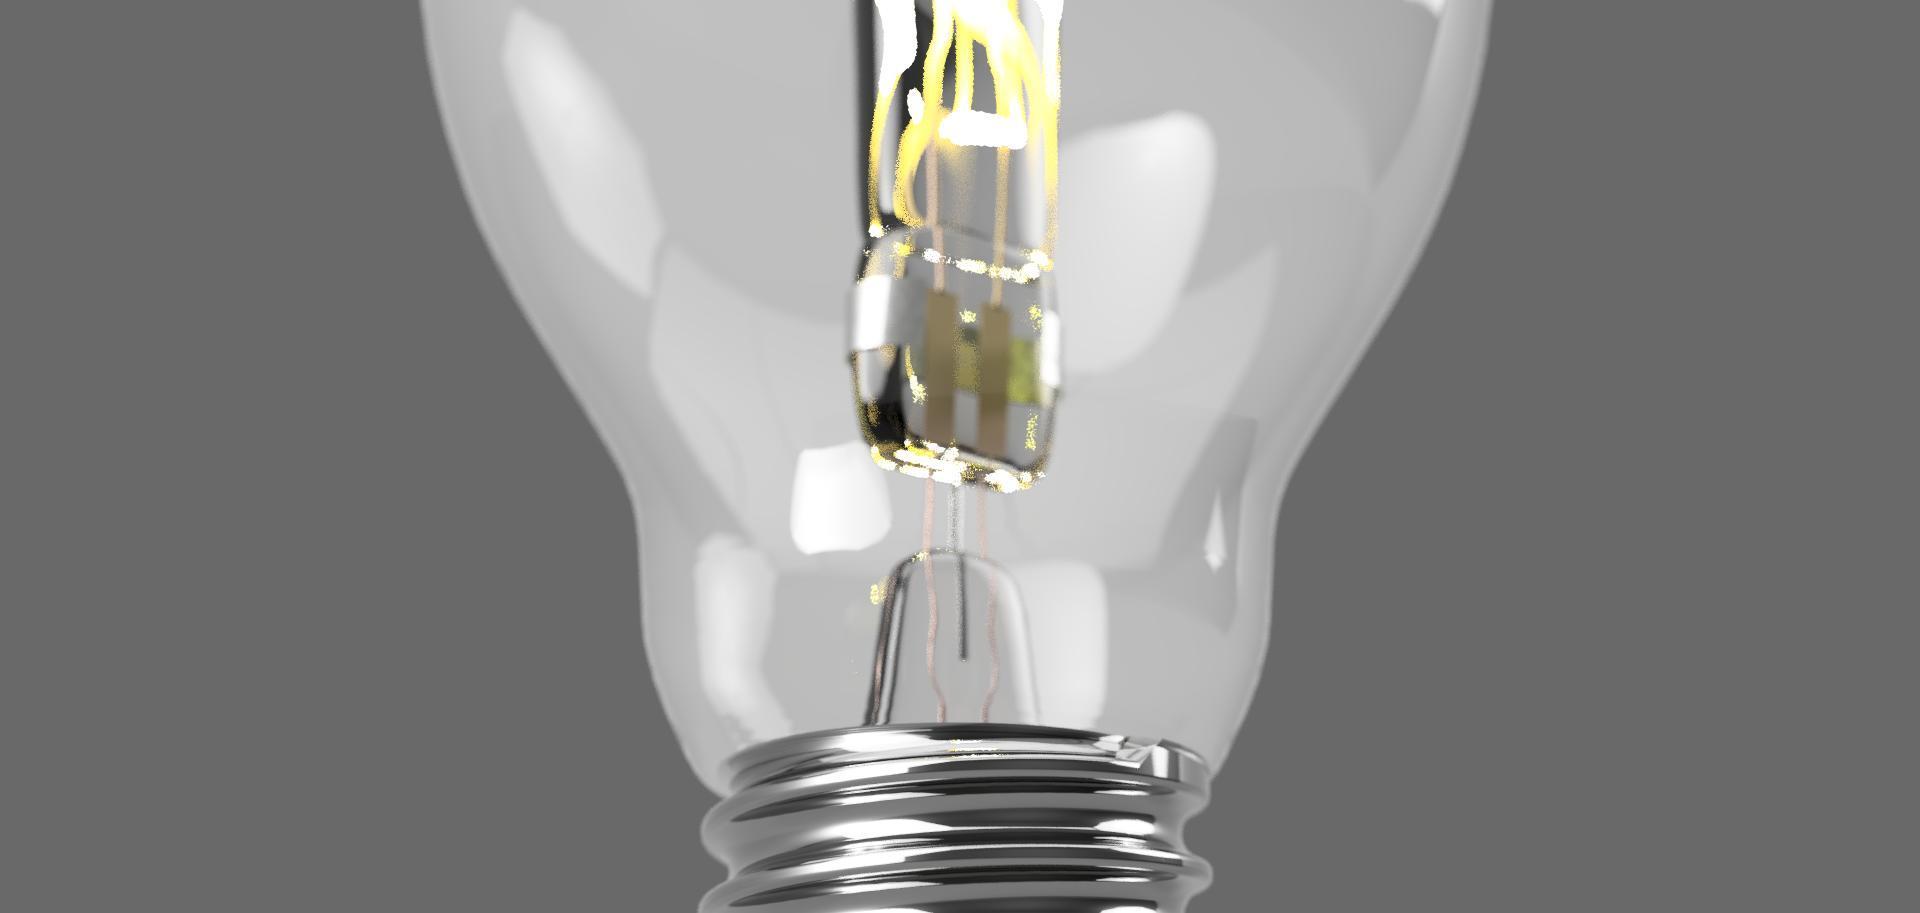 Halogen Light Bulb|Autodesk Online Gallery